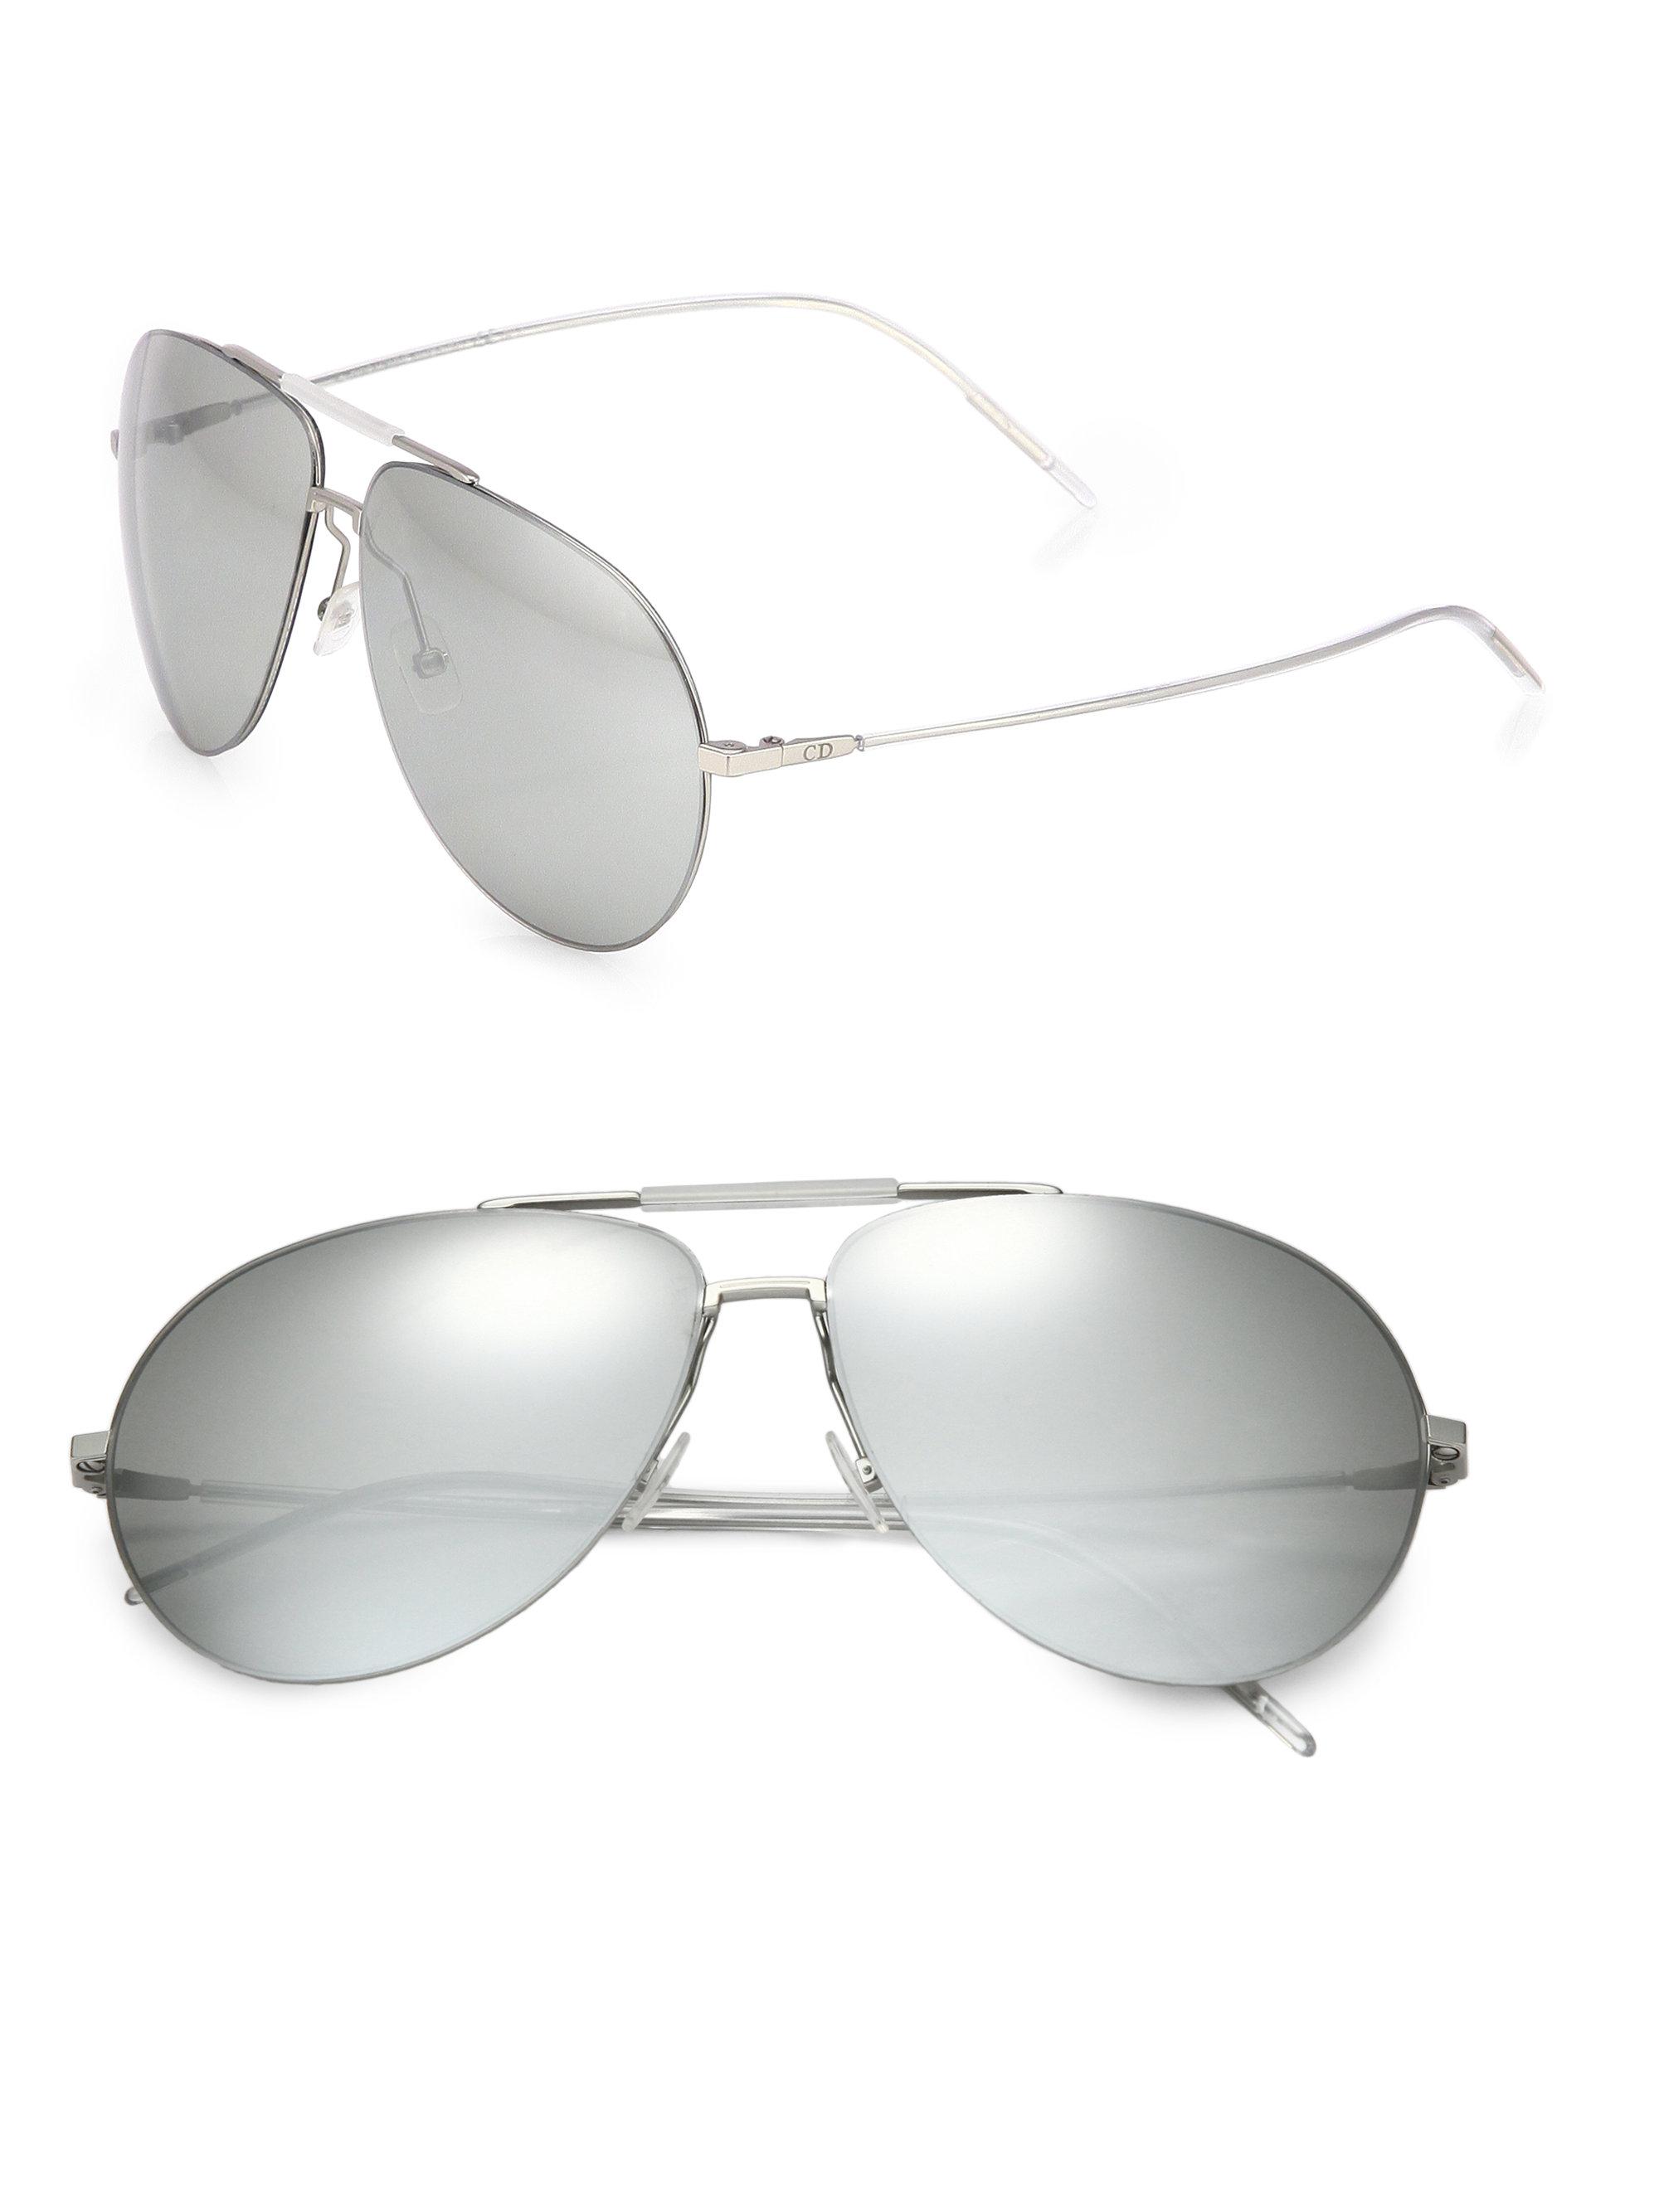 276da4d7144e Lyst - Dior Homme Metal Aviator Sunglasses in Metallic for Men